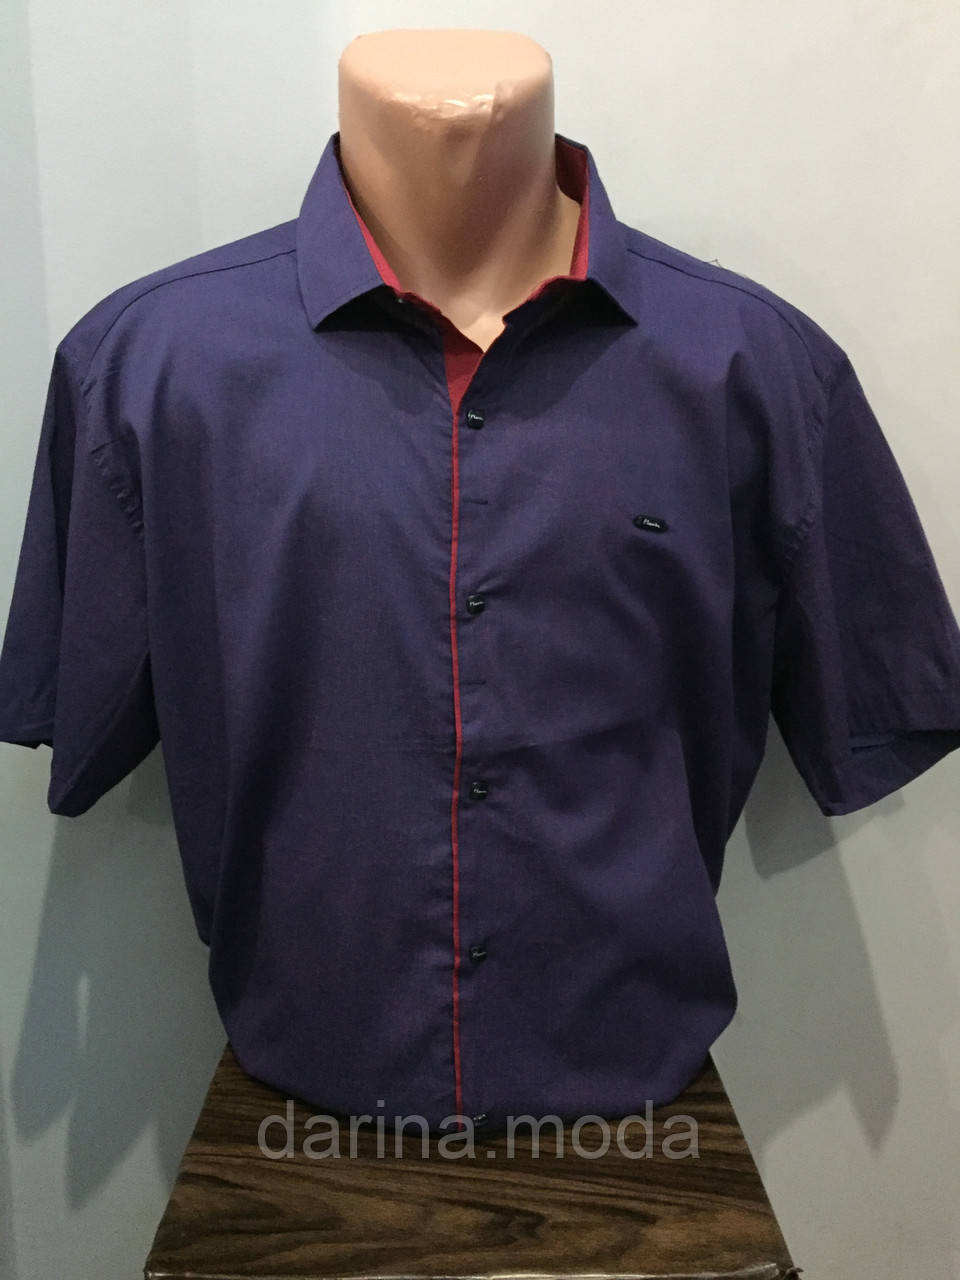 Чоловіча сорочка батал на кнопках 3XL